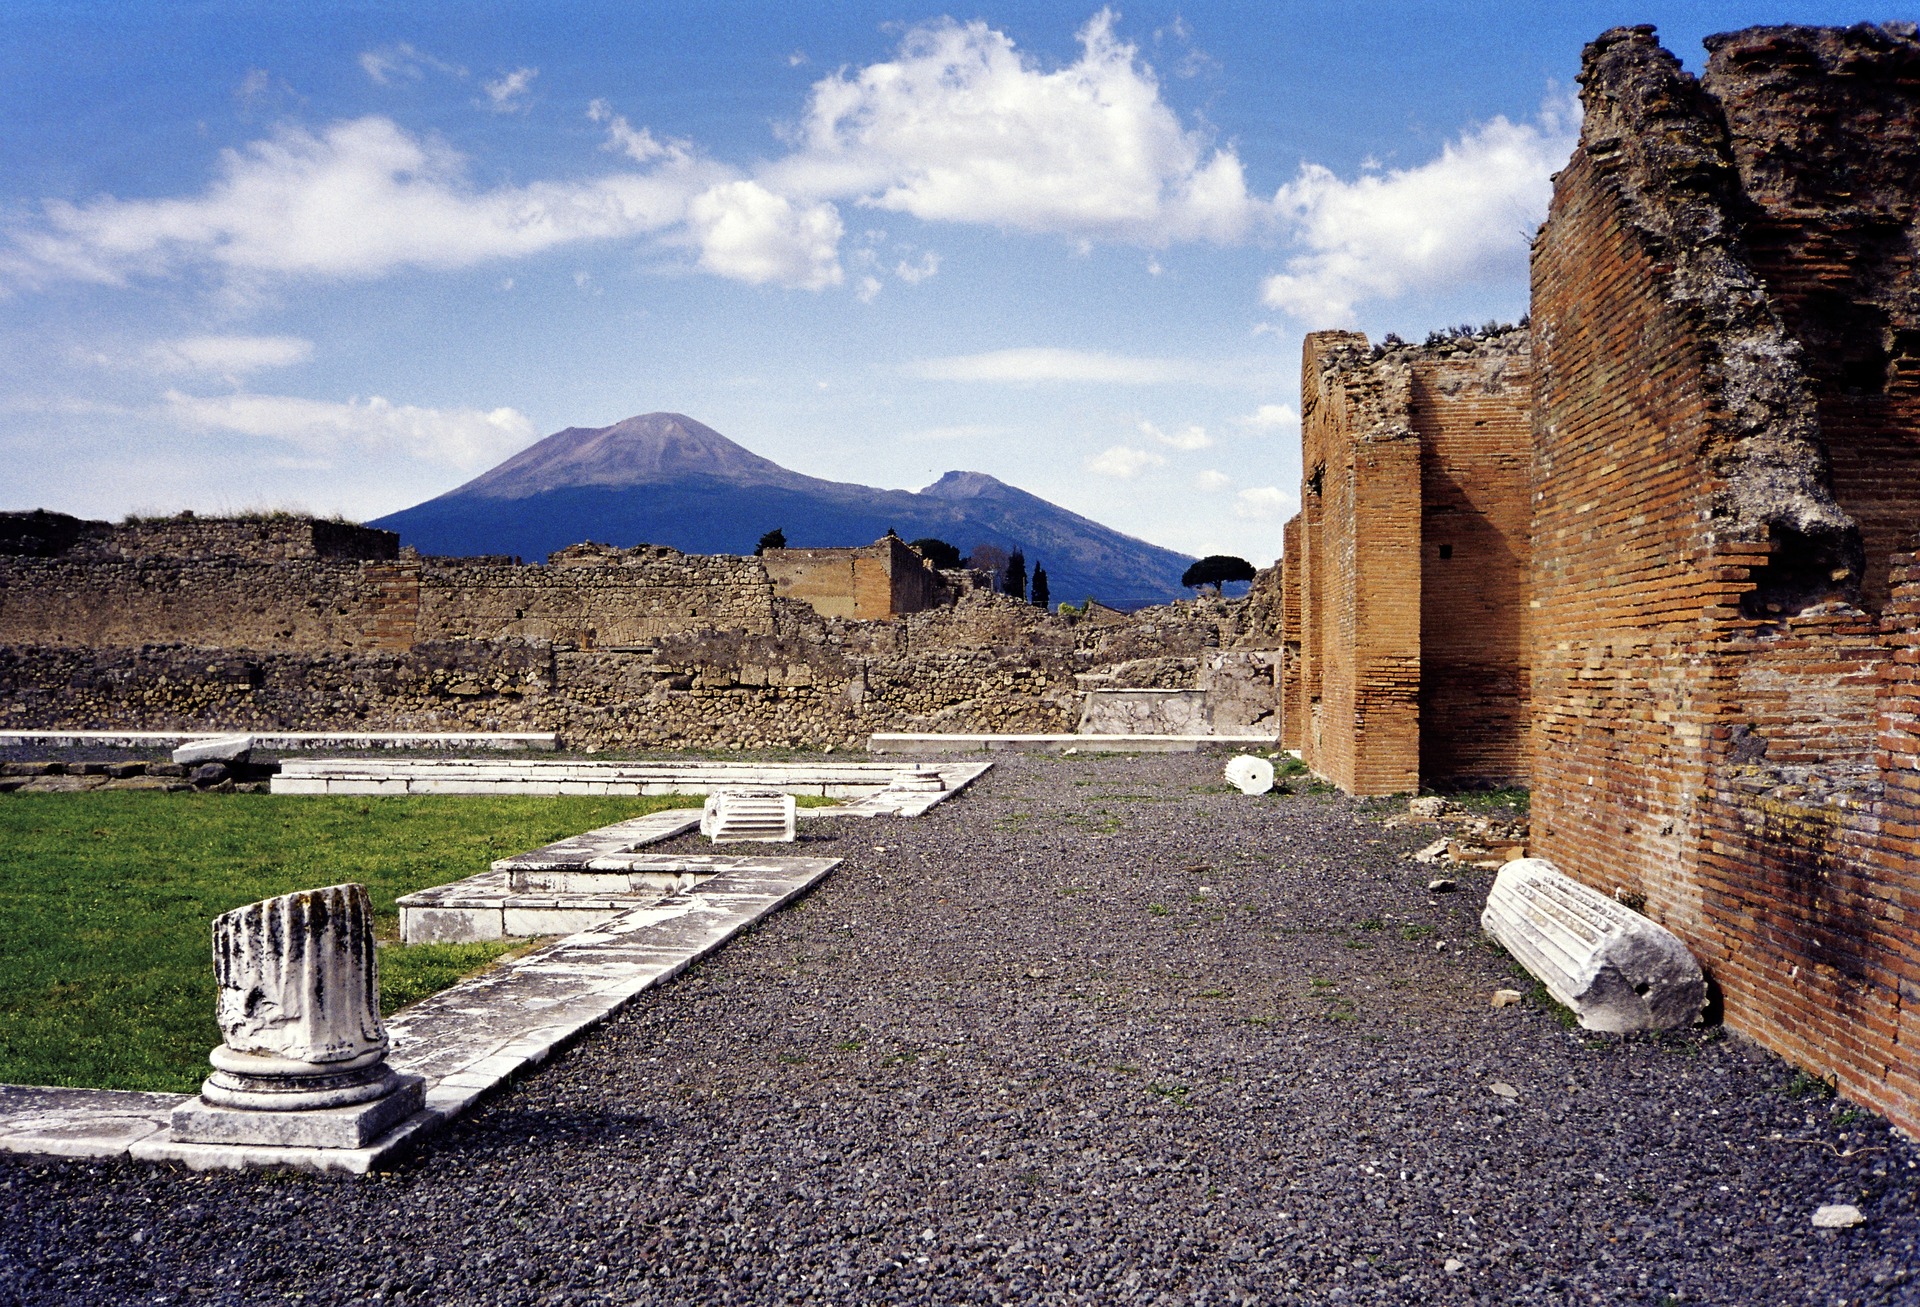 Mount Vesuvius - Wikipedia